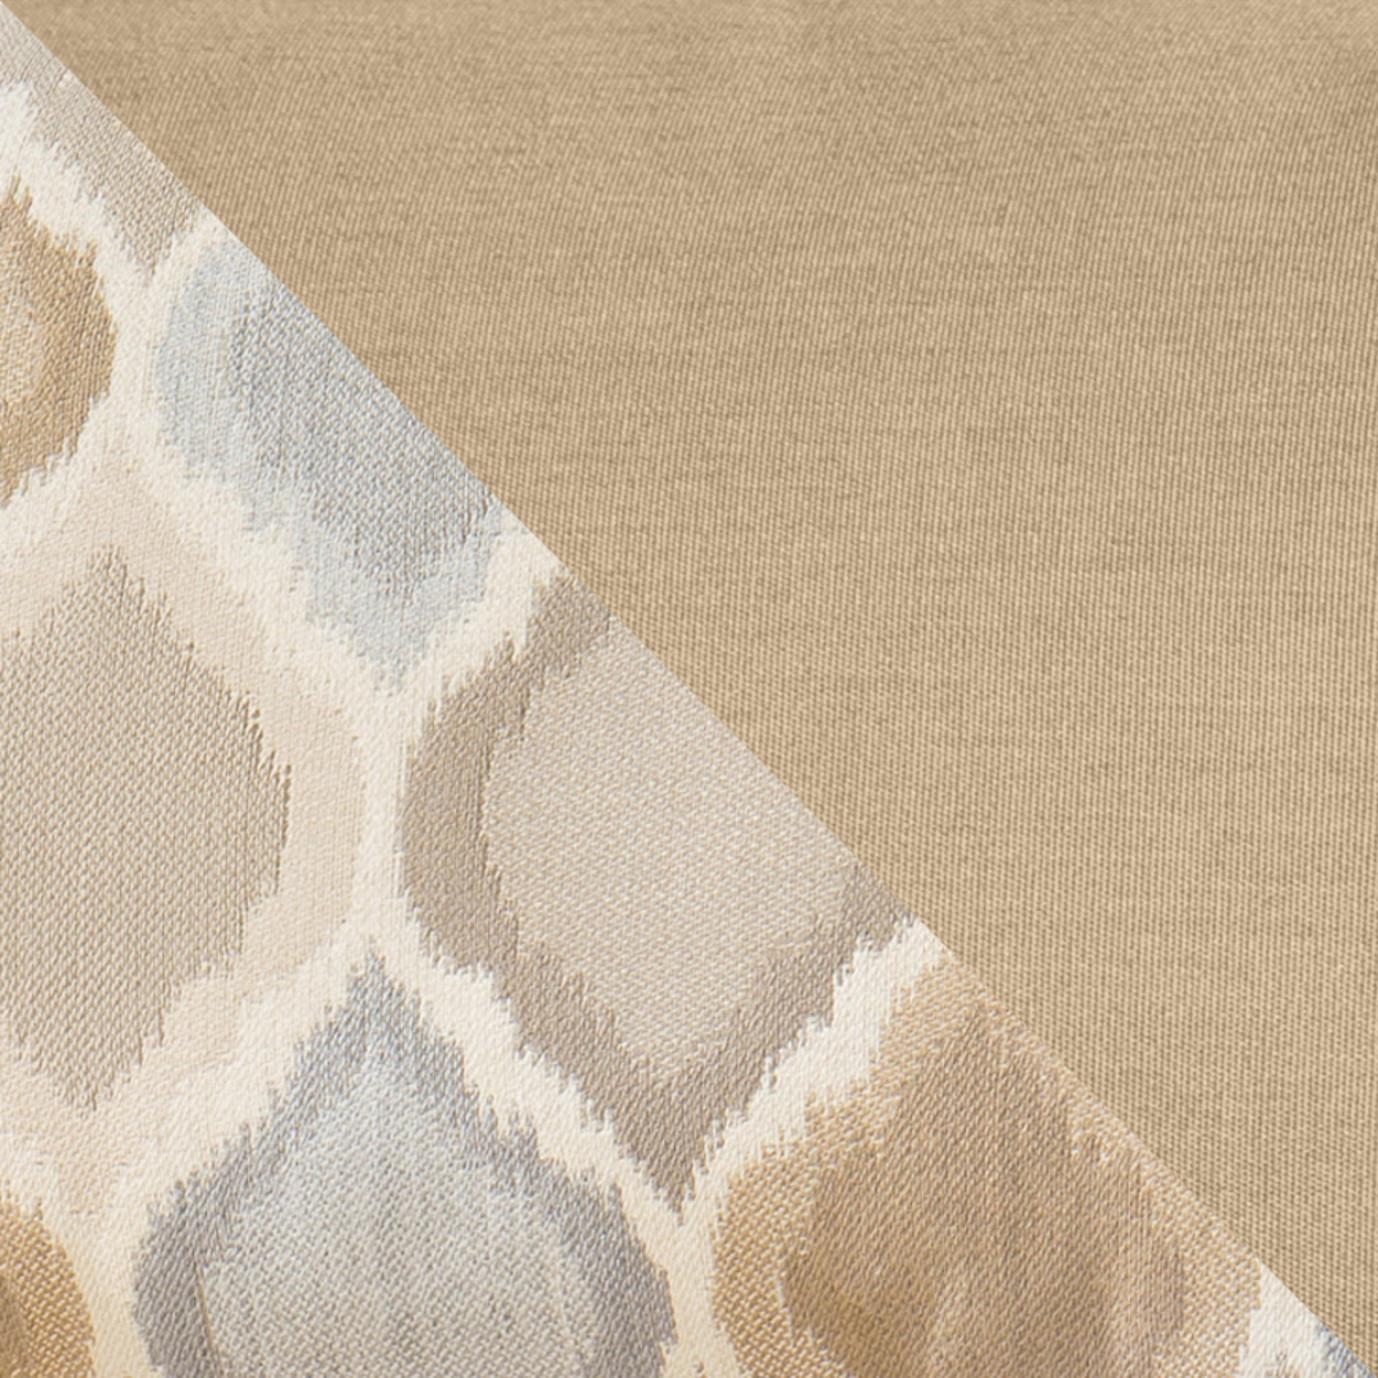 Portofino™ Comfort 3pc Chaise Lounge Set - Heather Beige